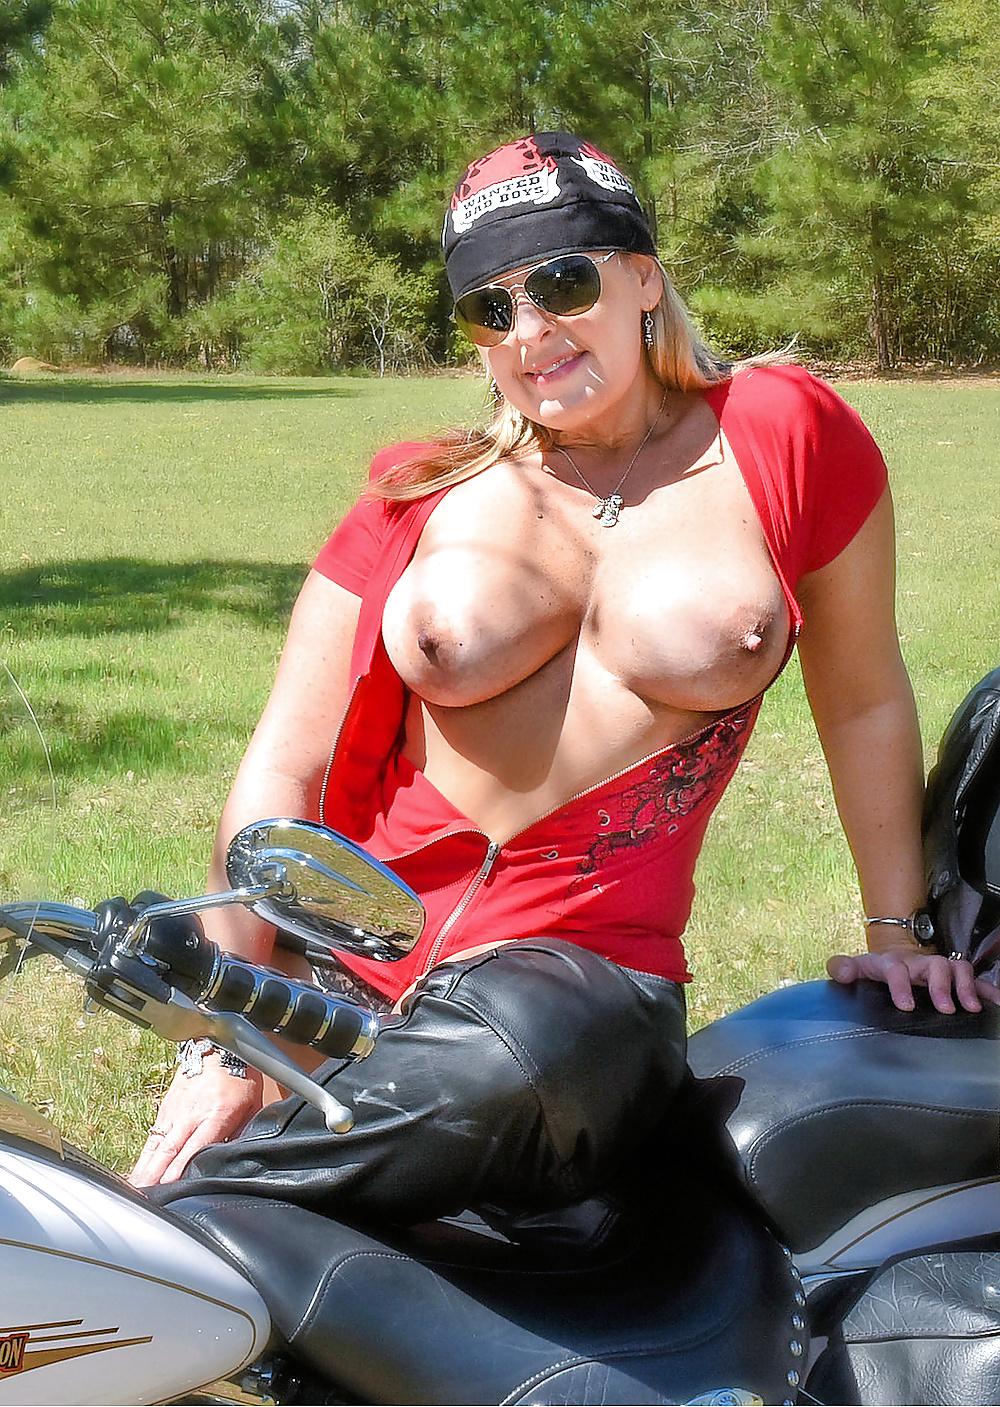 amateur-chubby-biker-rally-bitches